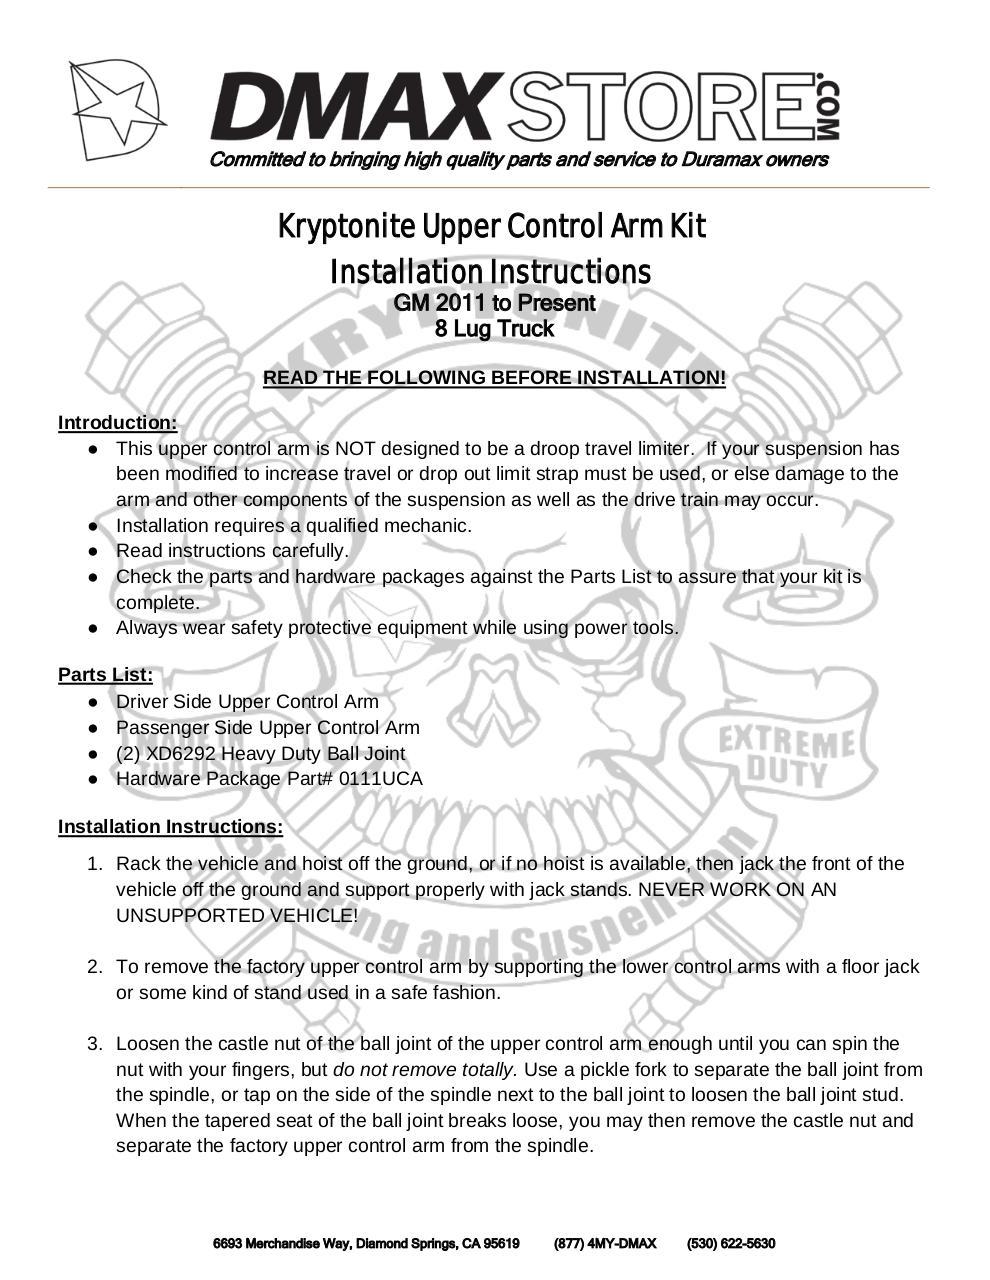 kryptonite UCA LML install insructions by Elizabeth - PDF Archive